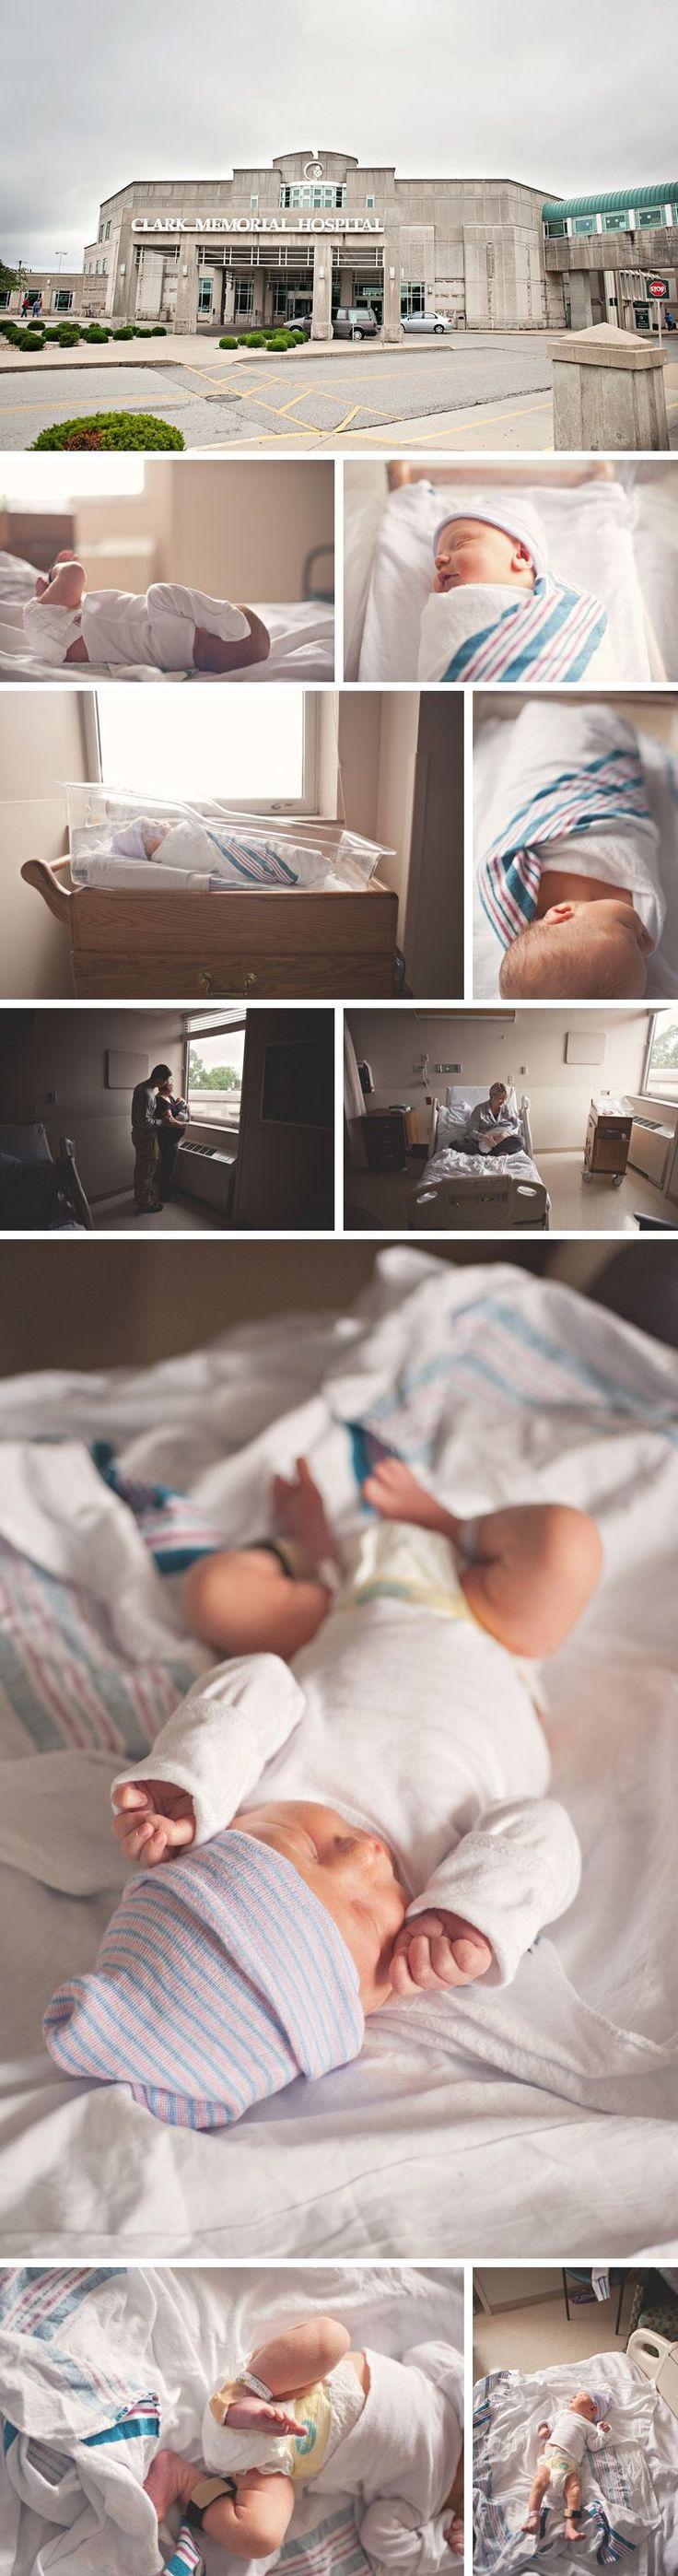 Newborn, hospital photos